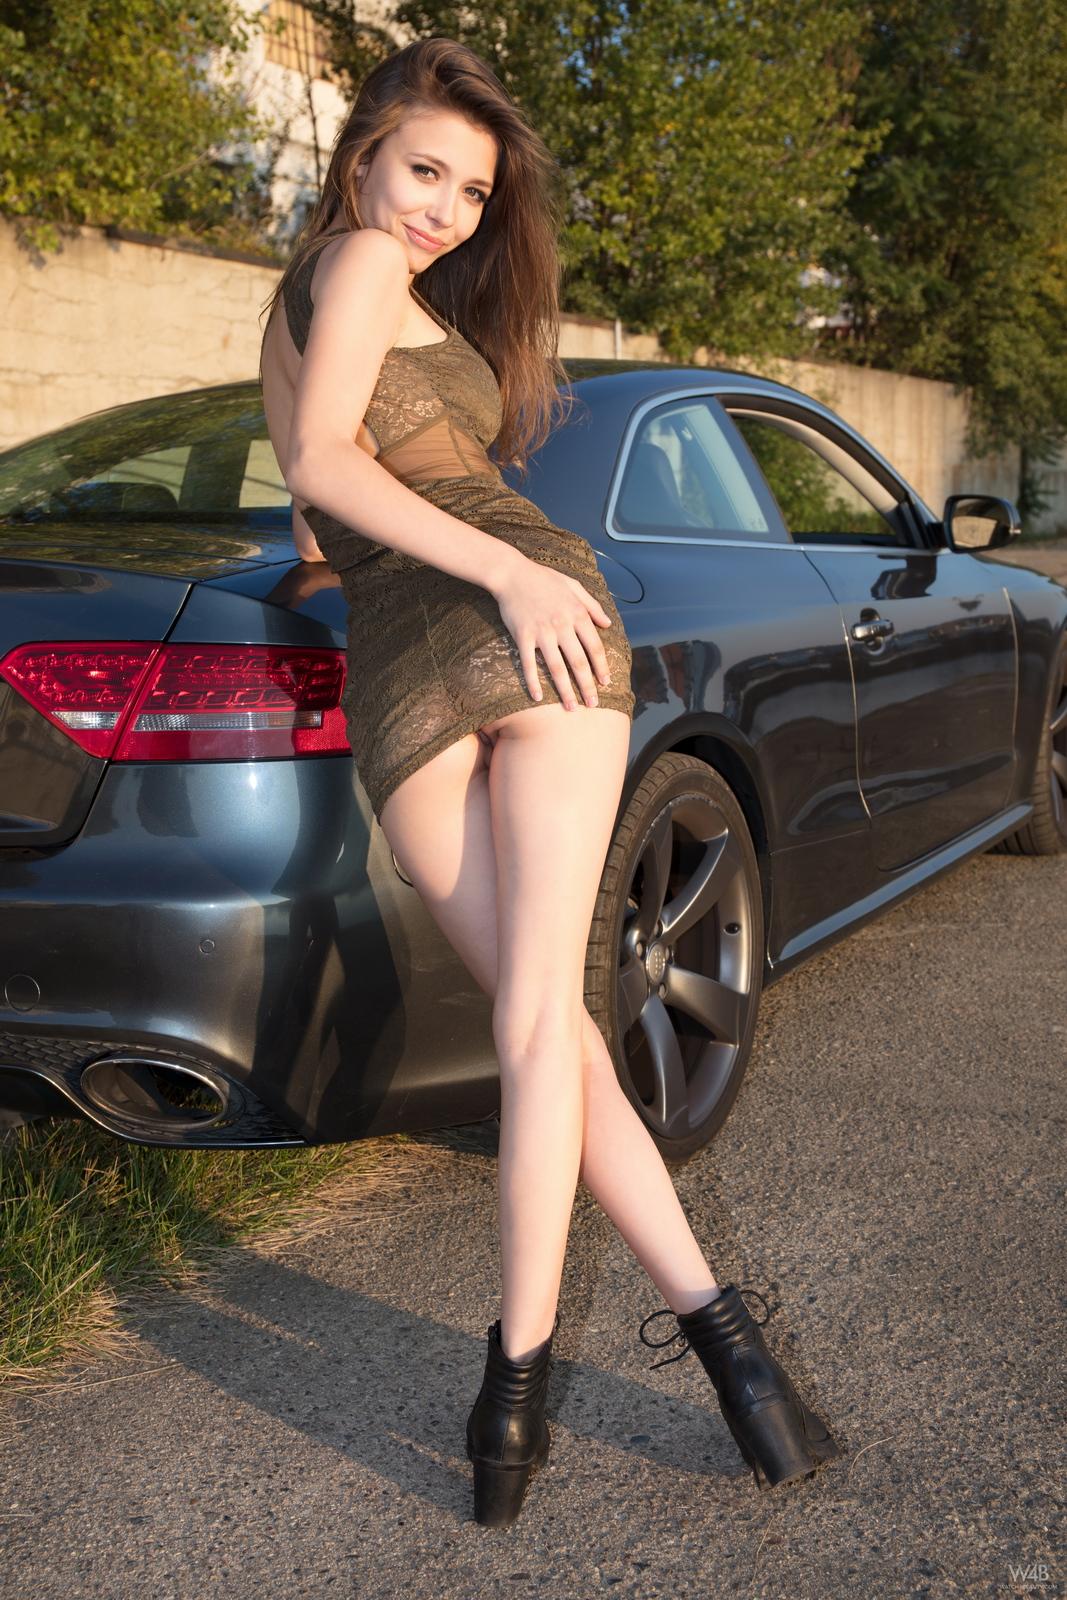 https://redbust.com/stuff/mila-azul-audi-rs5/milla-nude-audi-rs5-cars-pussy-watch4beauty-03.jpg